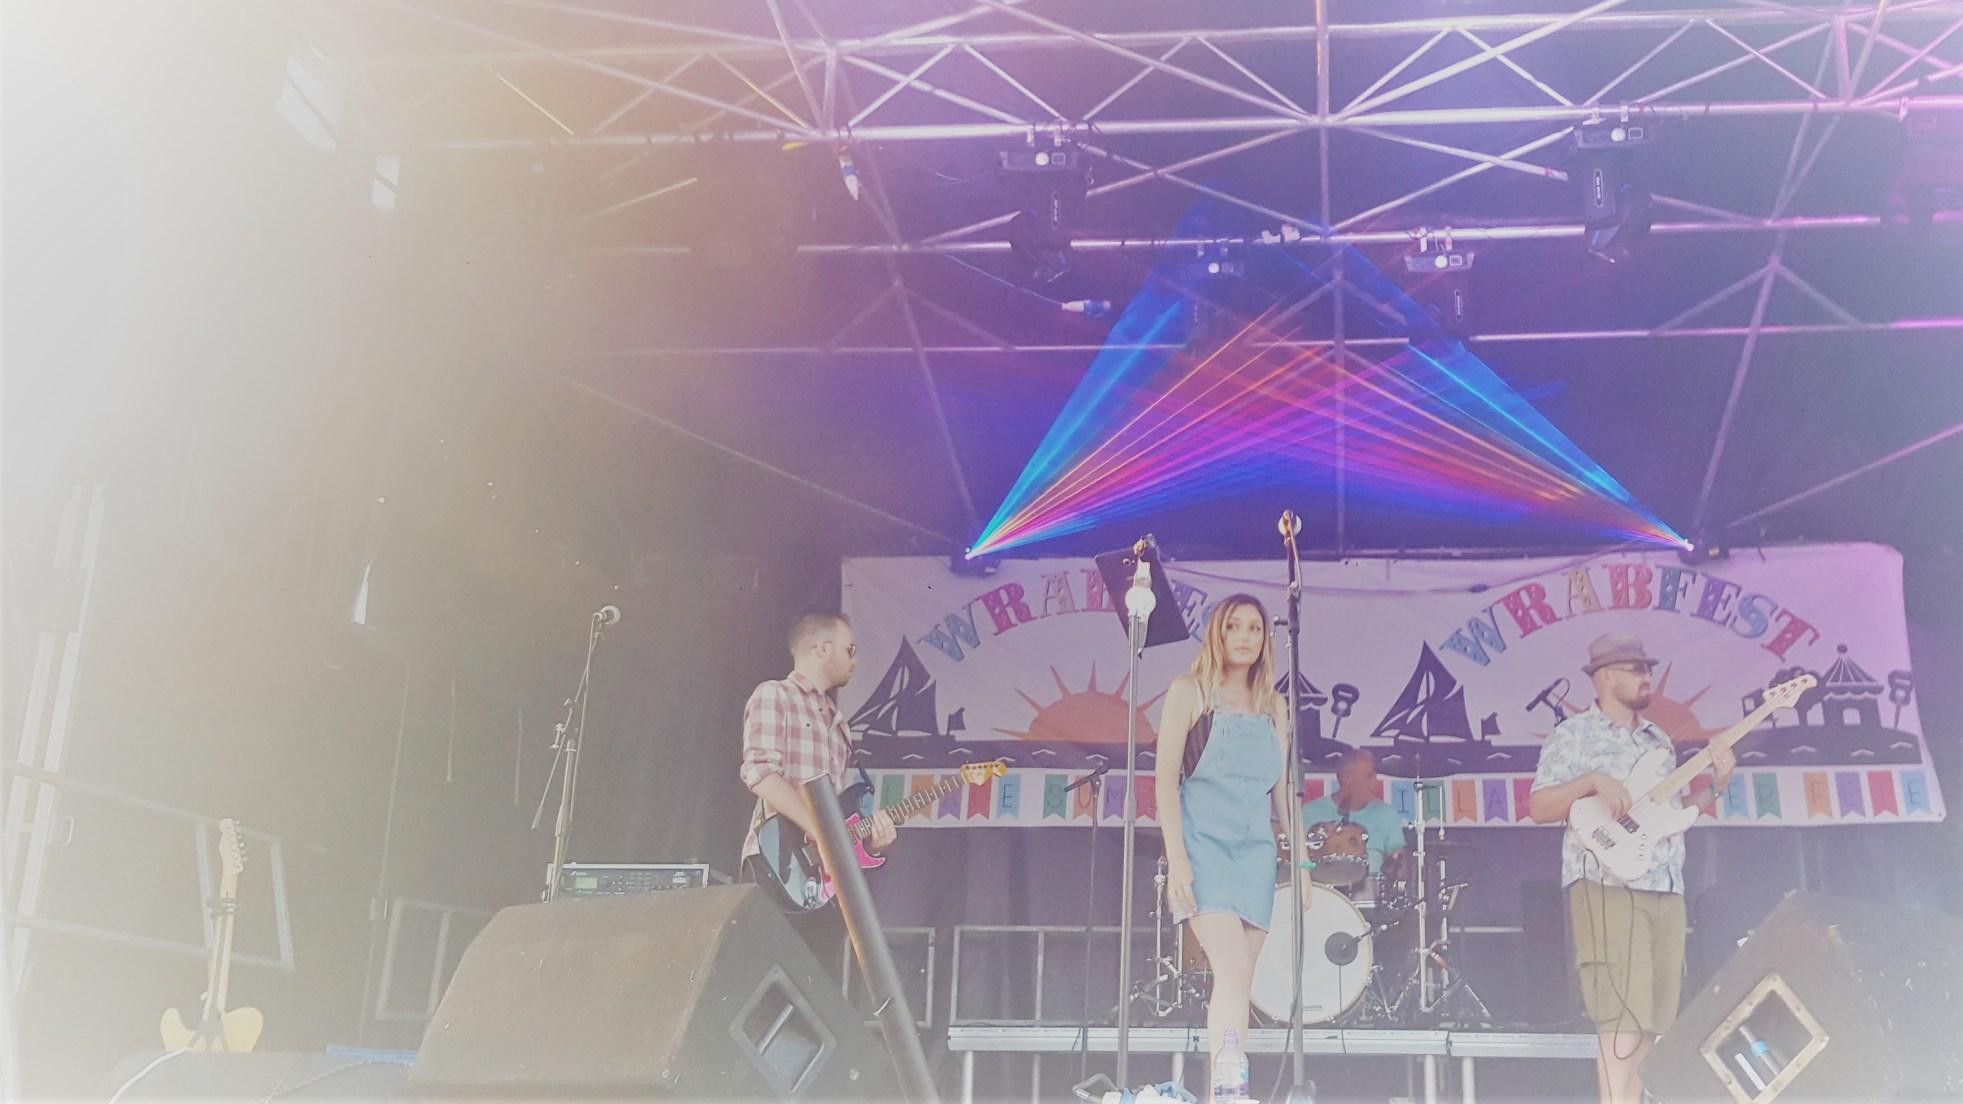 24 Karat Wrabfest 2018 Live Band Colchester Essex